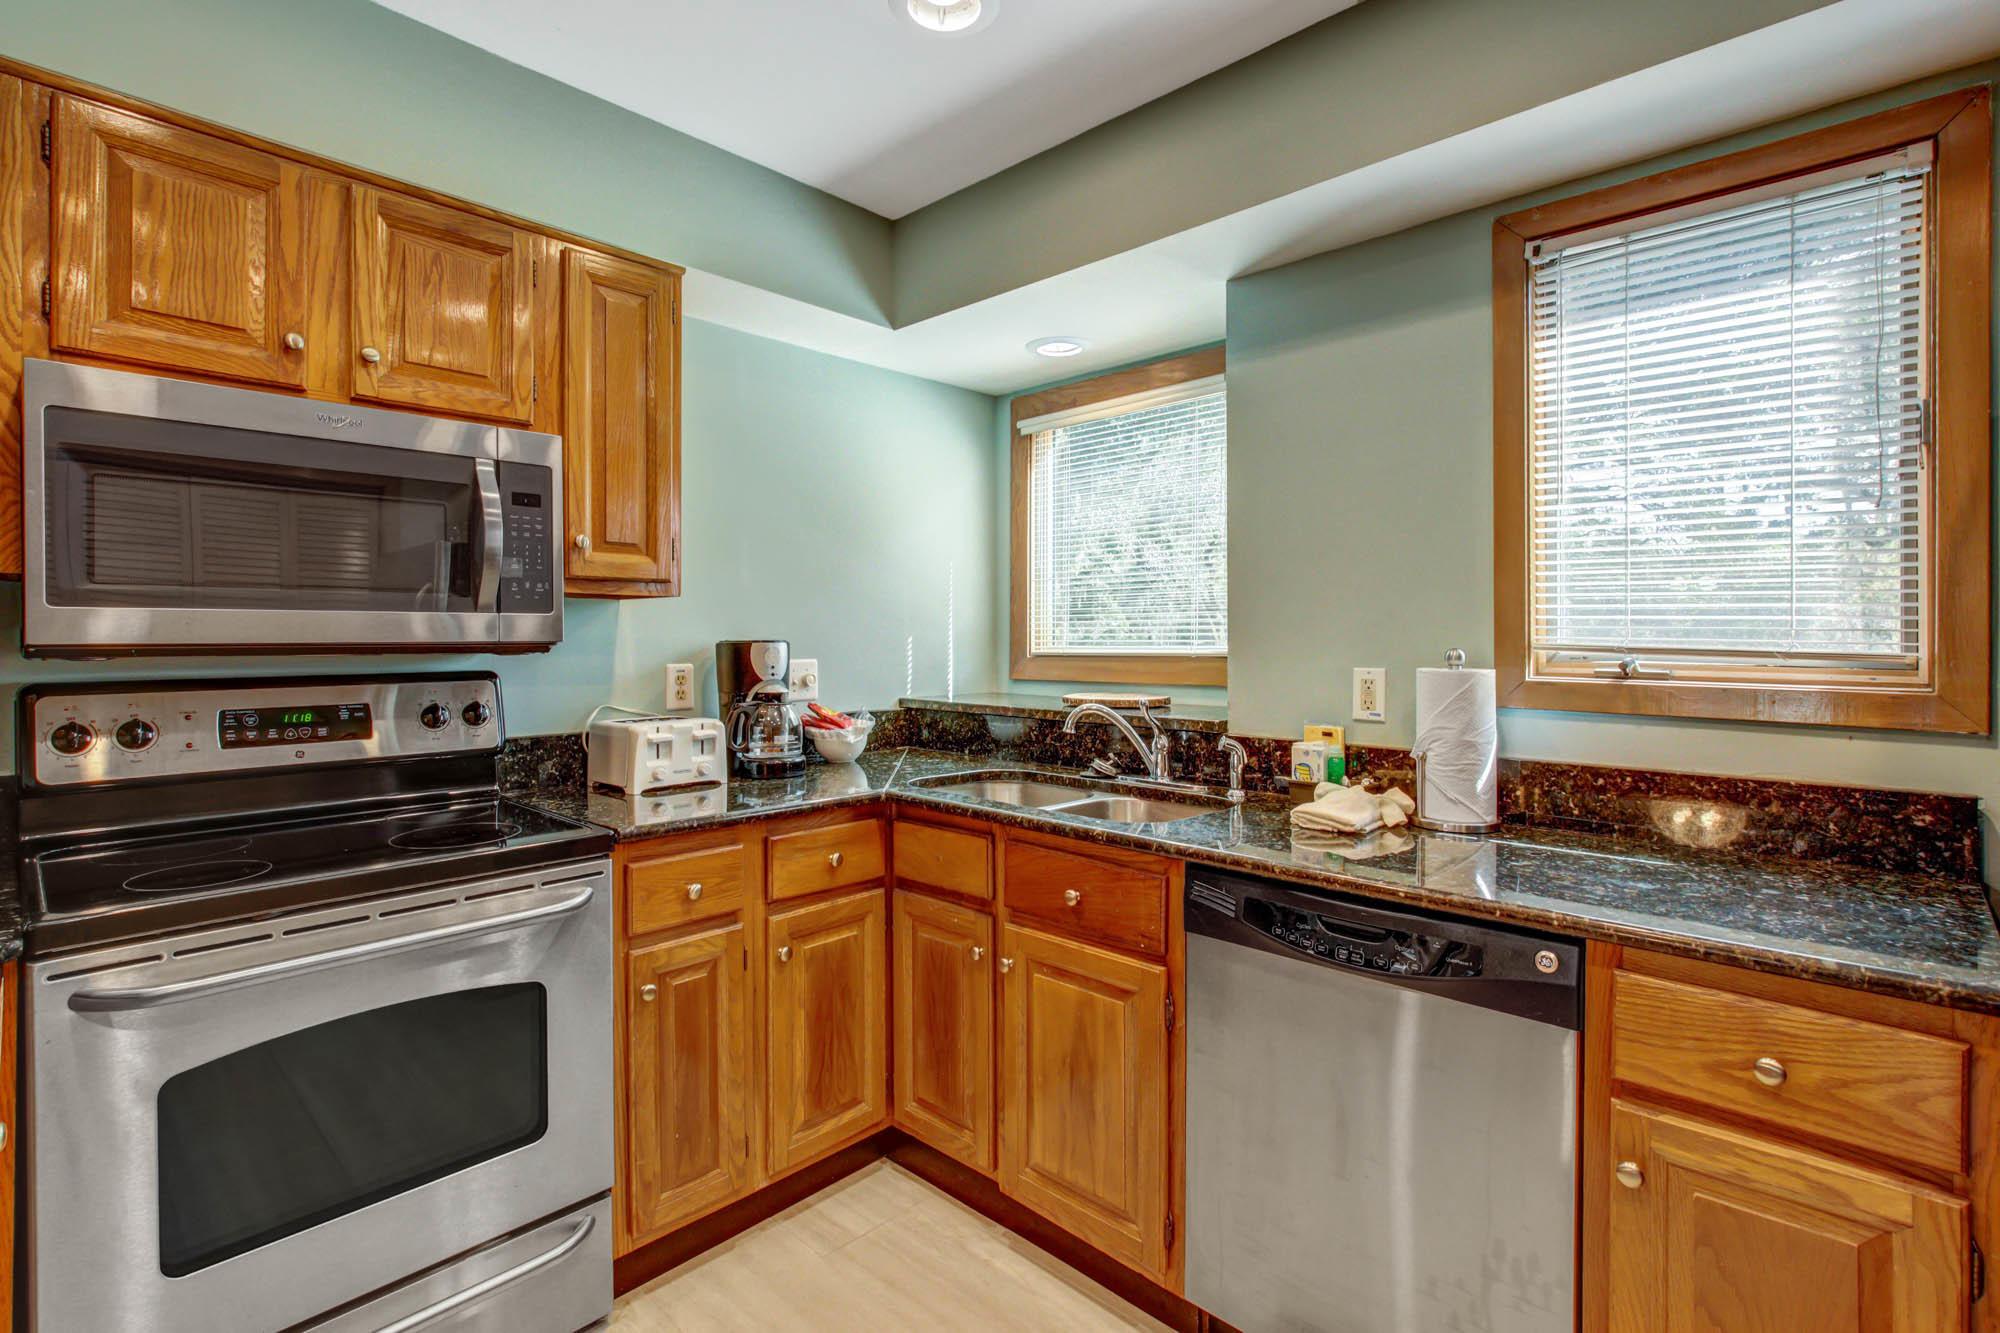 Kiawah Island Condos For Sale - 4525 Park Lake, Kiawah Island, SC - 39